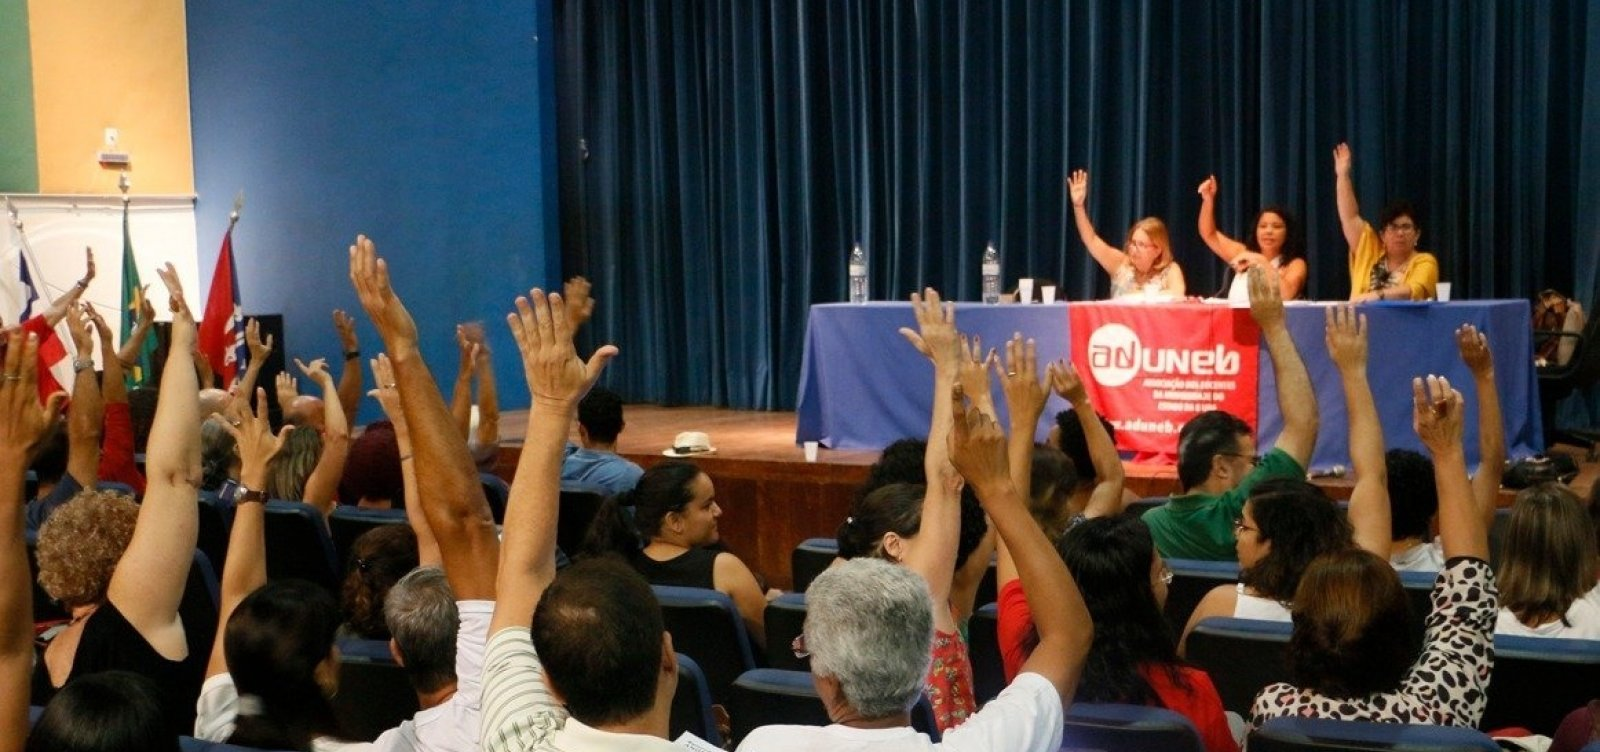 Após assembleia, professores da Uneb decidem manter greve